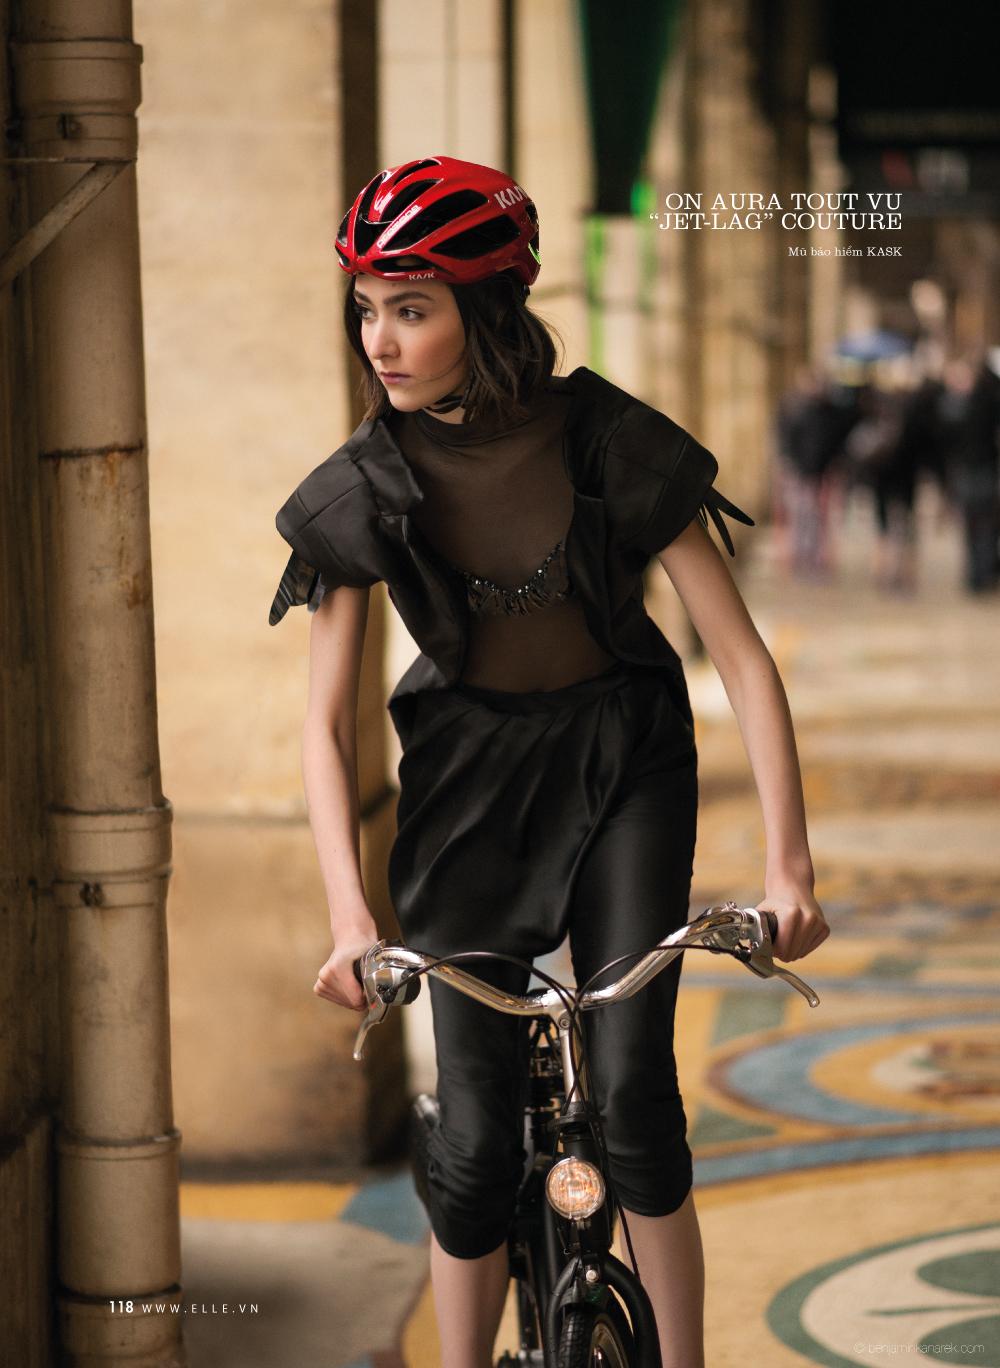 https://2.bp.blogspot.com/-1qcqHPhtNH0/VvmiEBgJRzI/AAAAAAABvYY/JtqdP2sb9BsQkPUCtH1DAxNHsCrRlNXnA/s1600/Mar-Gonzalez-in-Tour-de-France-by-Benjamin-Kanarek-for-ELLE-10.jpg